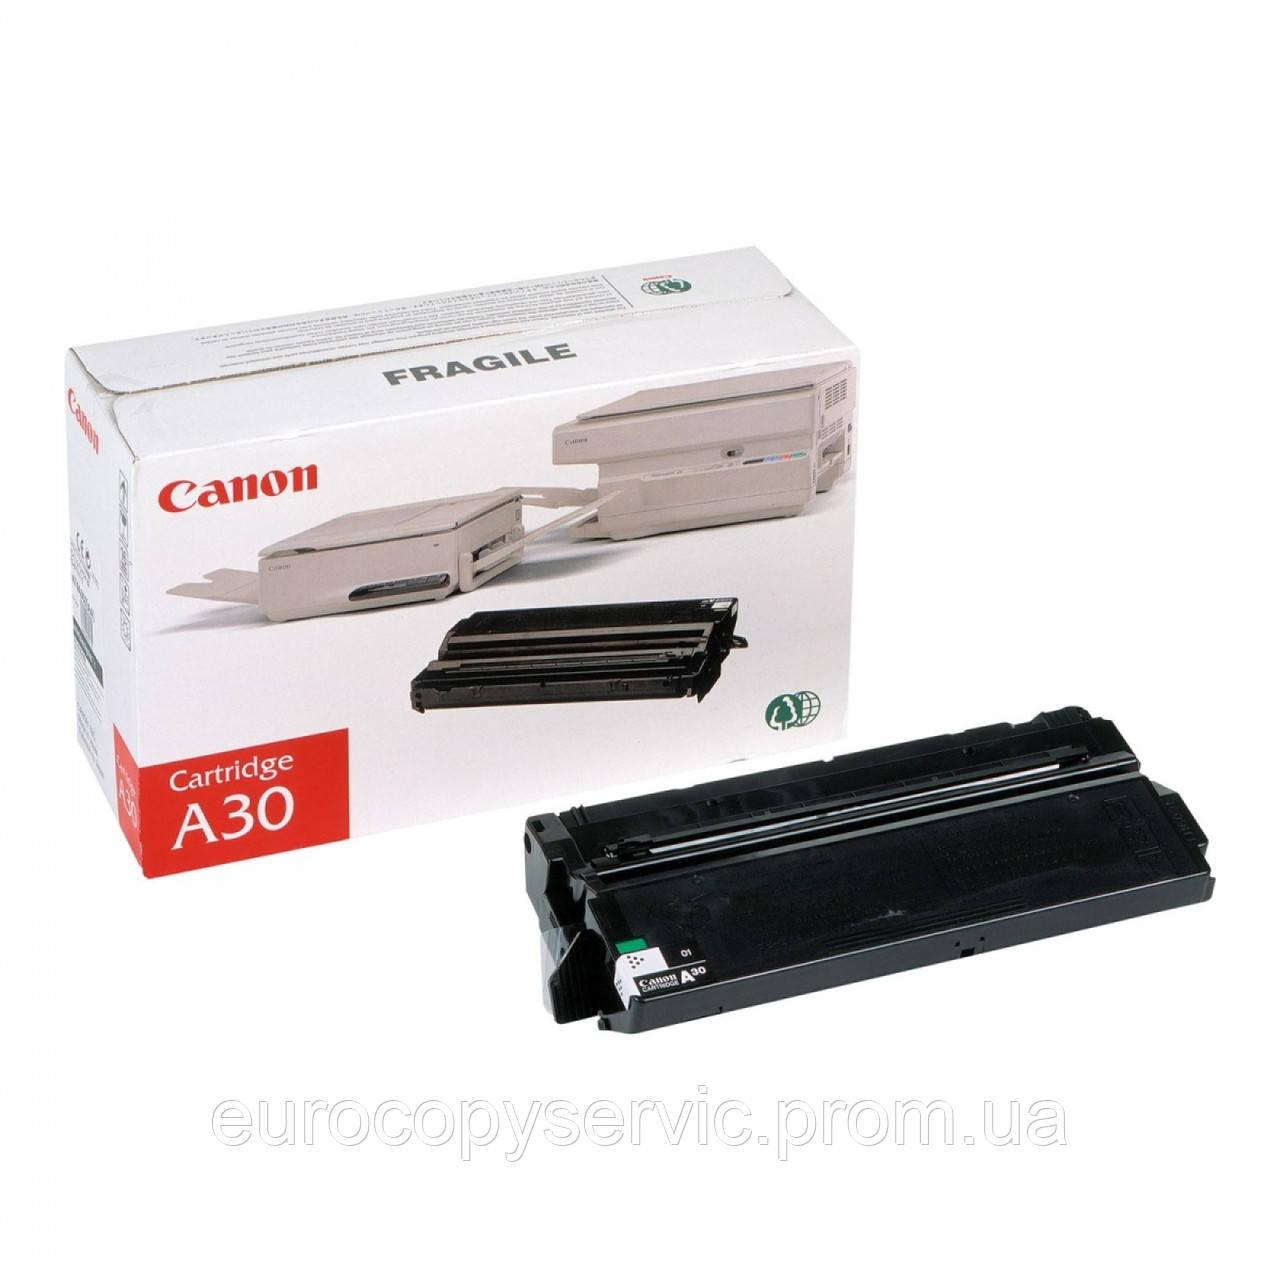 Тонер-картридж Canon A30 FC1/2/3/5, PC6/7/11 ресурс 3 500 стор. Black (1474A003) Original